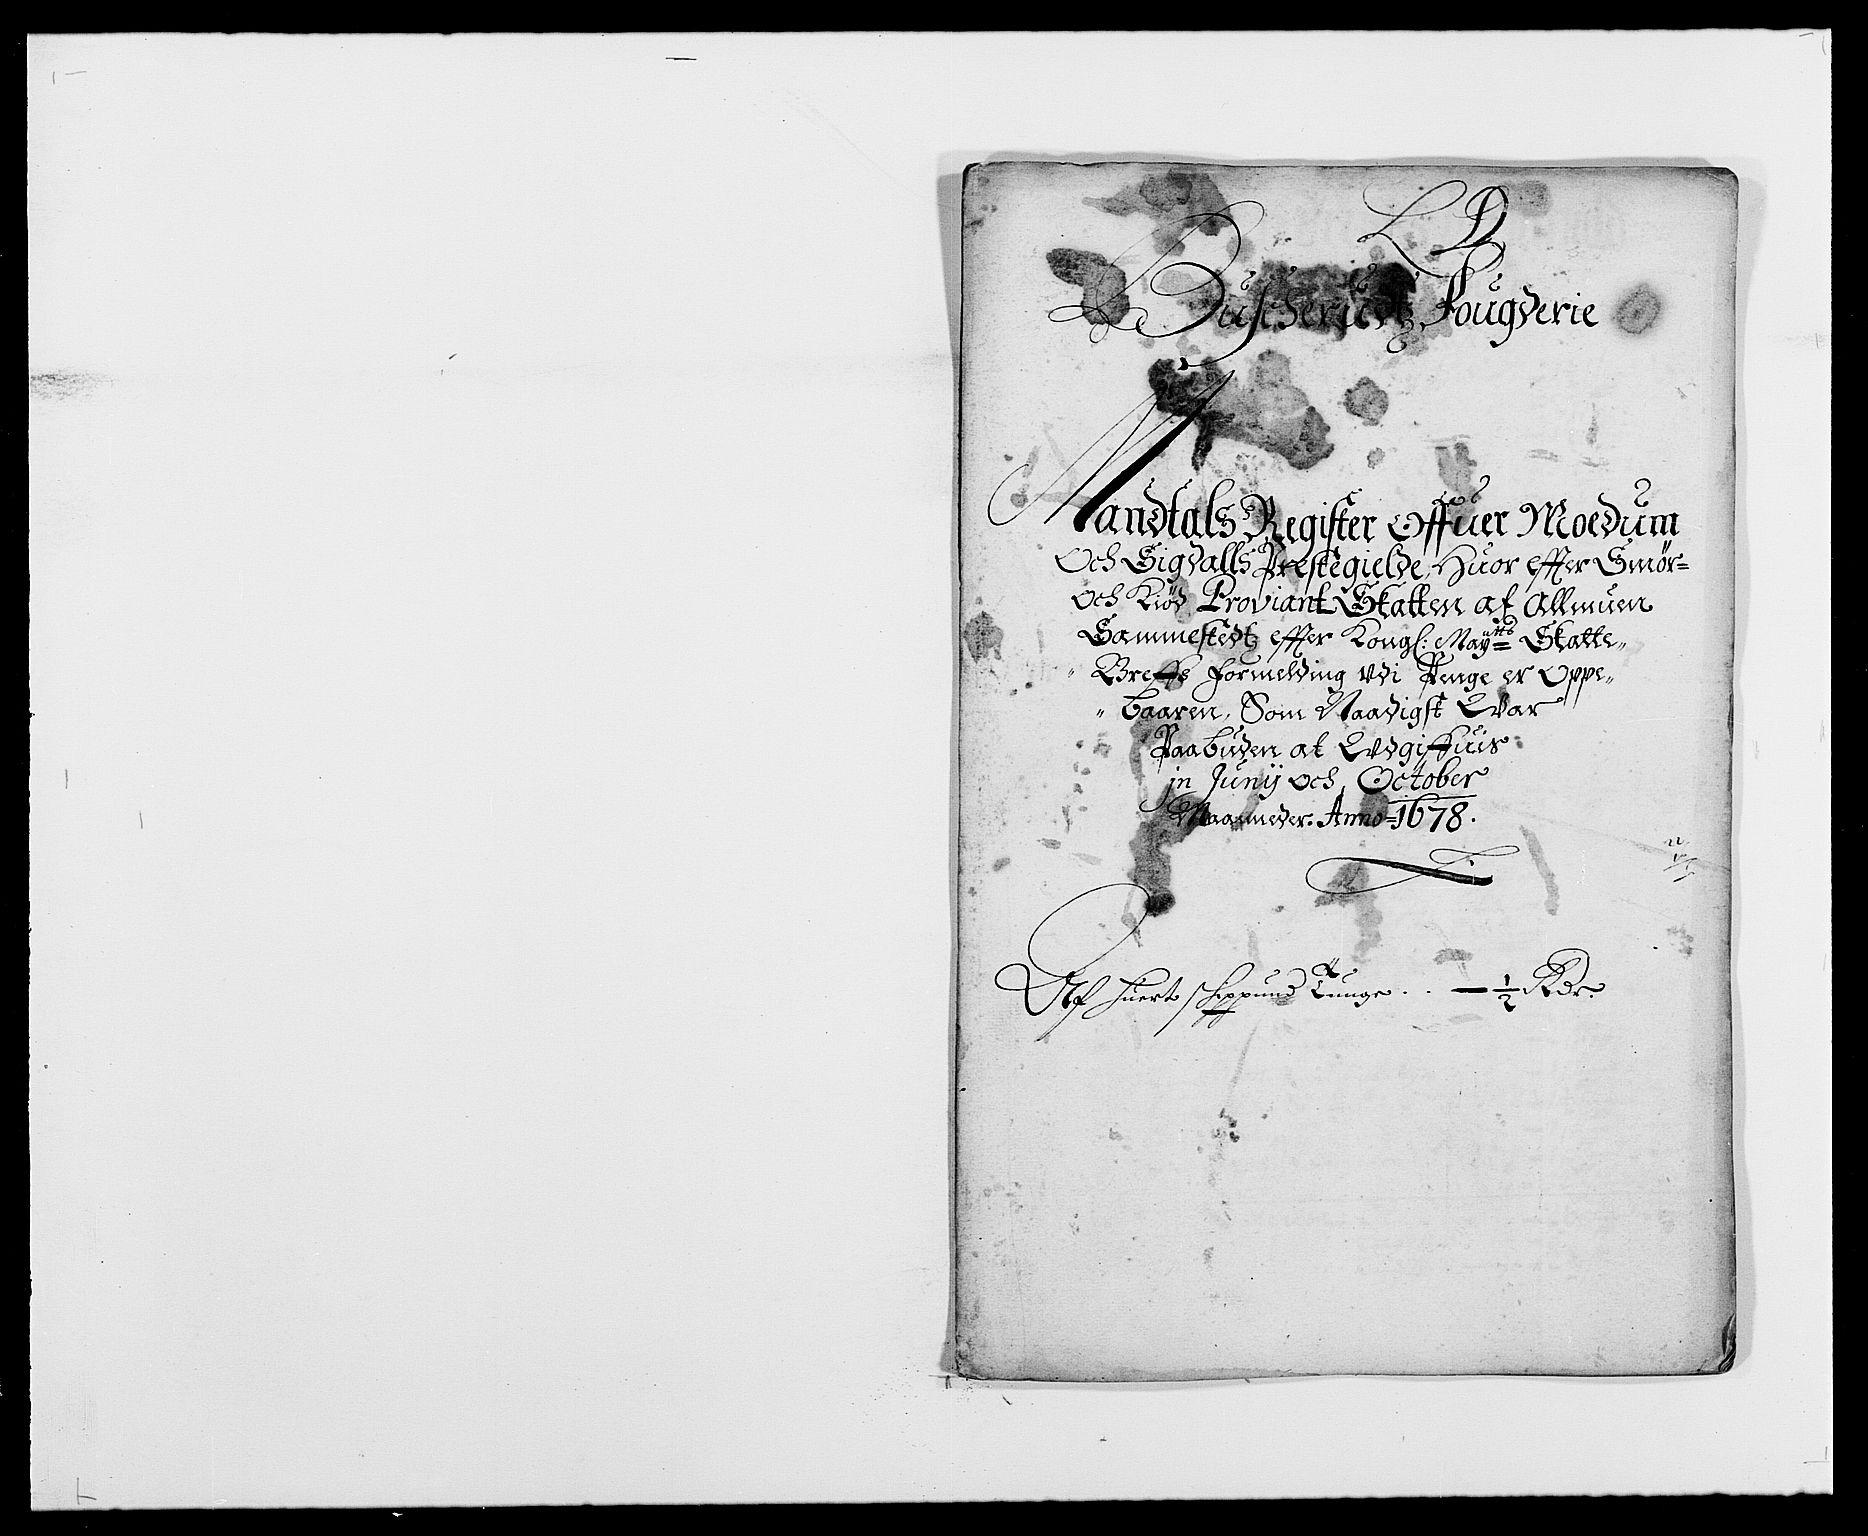 RA, Rentekammeret inntil 1814, Reviderte regnskaper, Fogderegnskap, R25/L1674: Fogderegnskap Buskerud, 1678-1681, s. 109